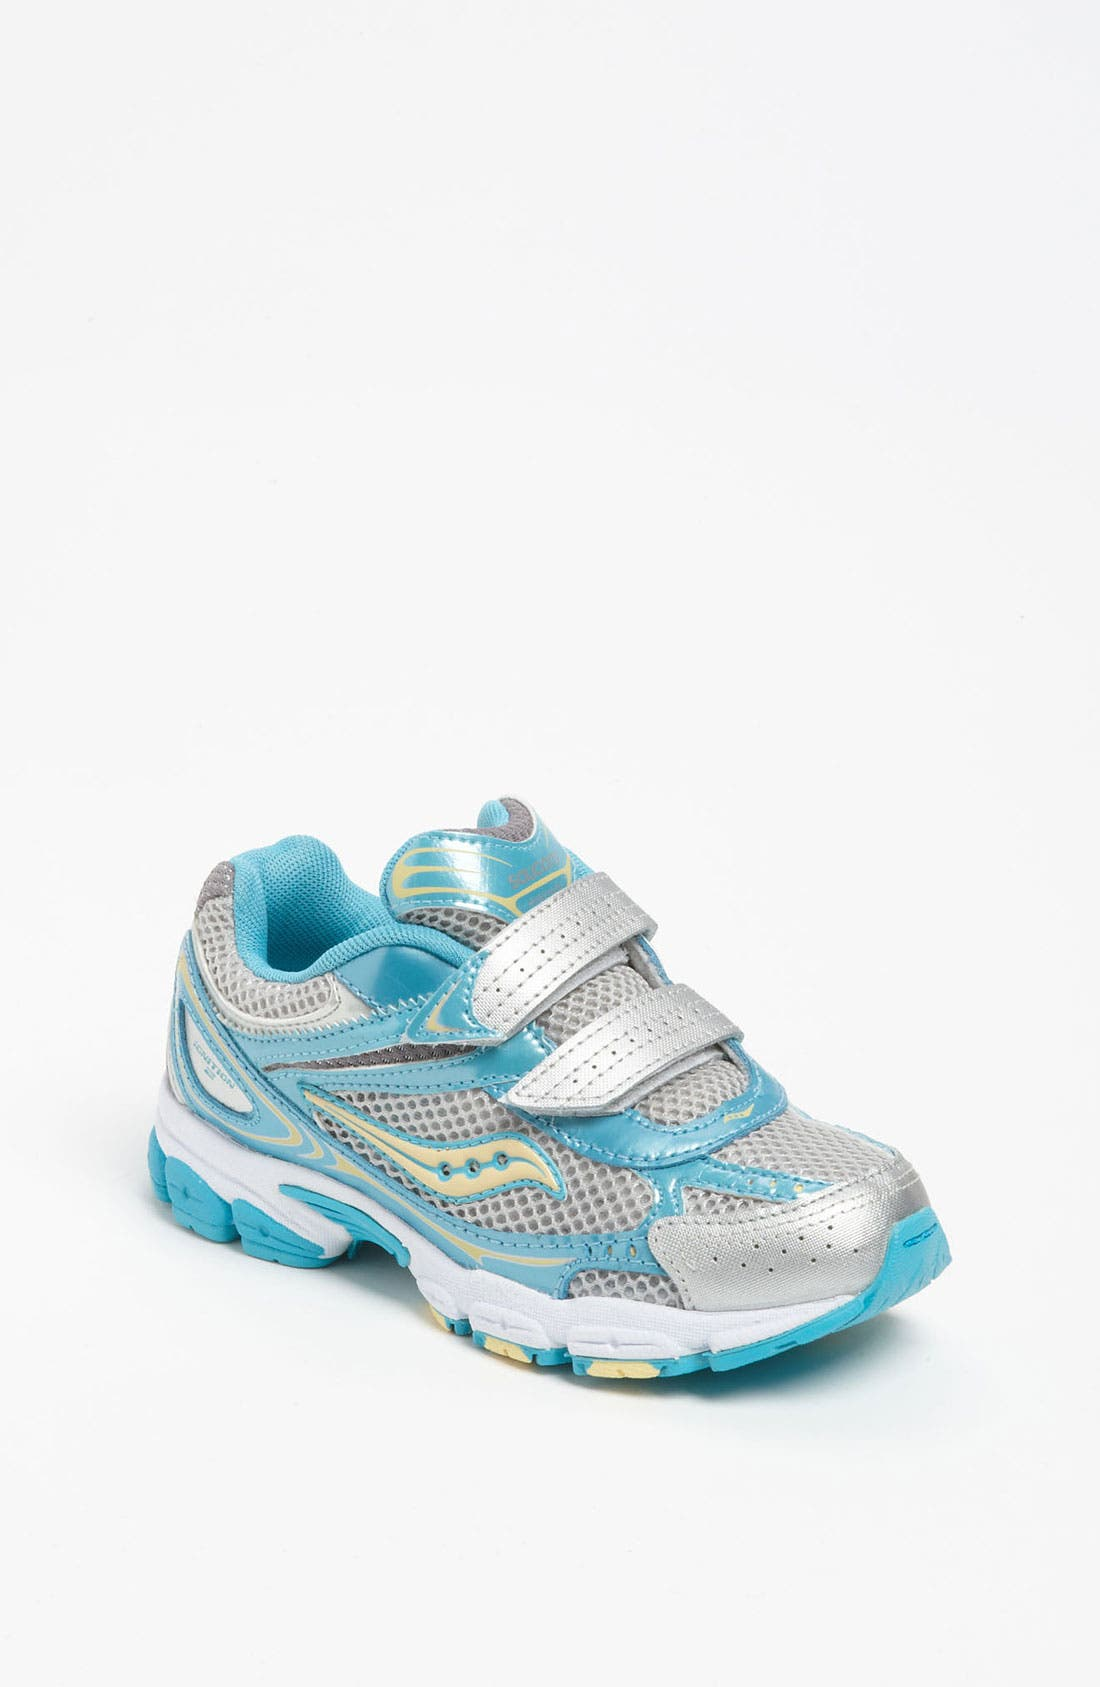 Main Image - Saucony 'Grid Profile' Sneaker (Toddler & Little Kid)